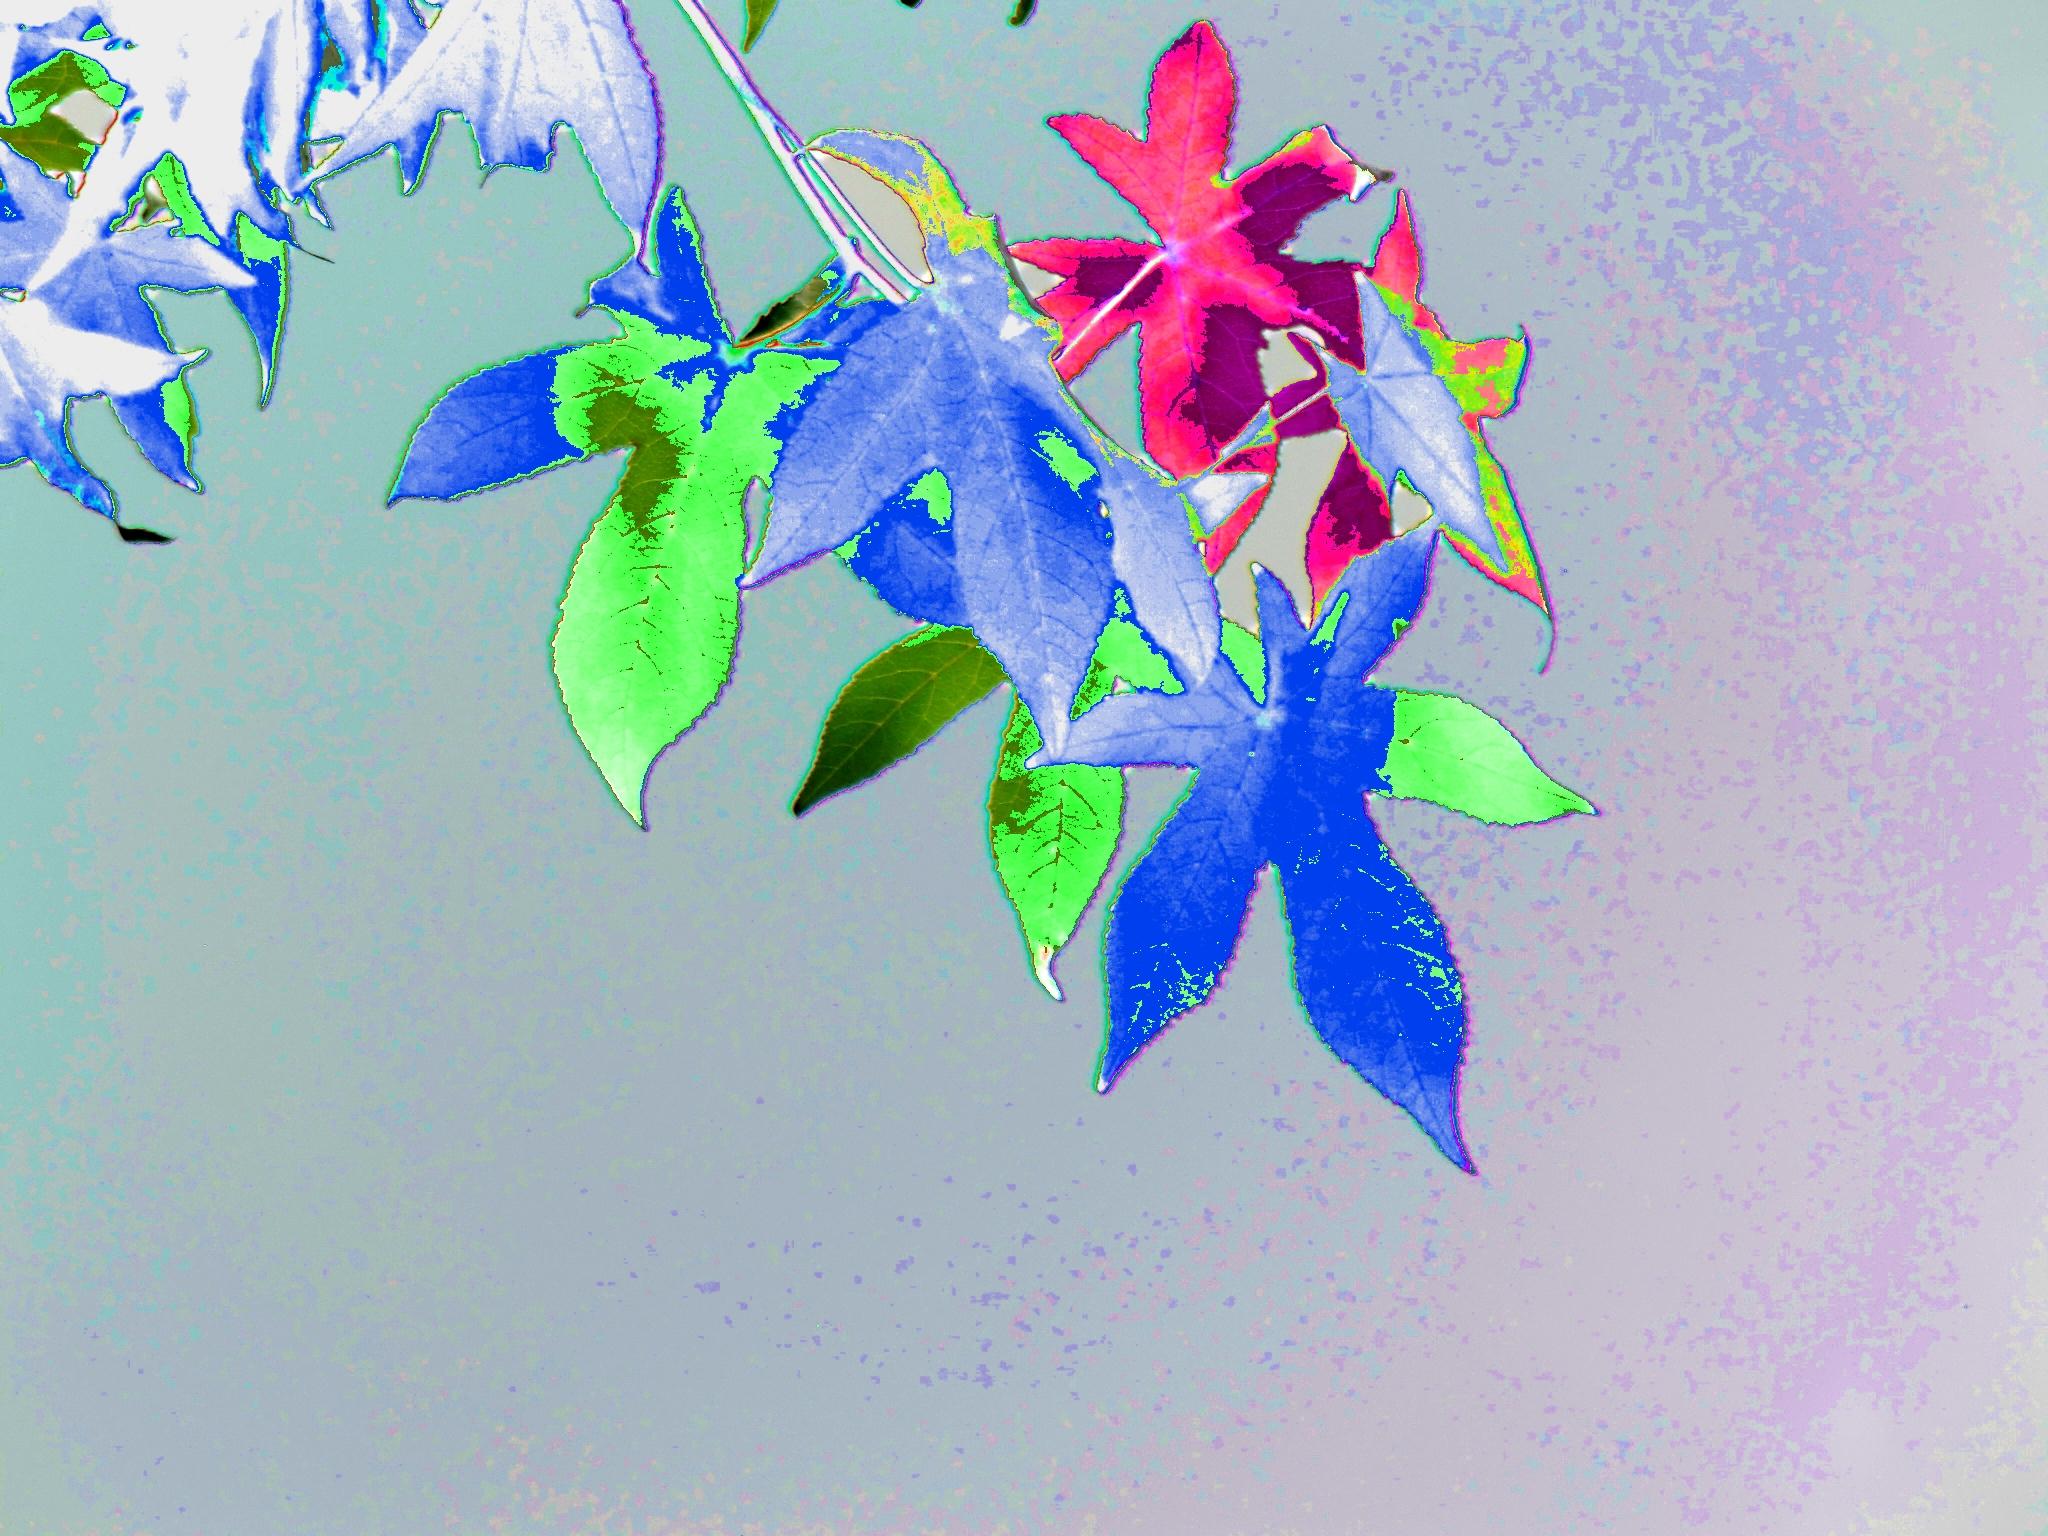 Image: Magical Sweetgum Tree Leaves - Gus Kilthau